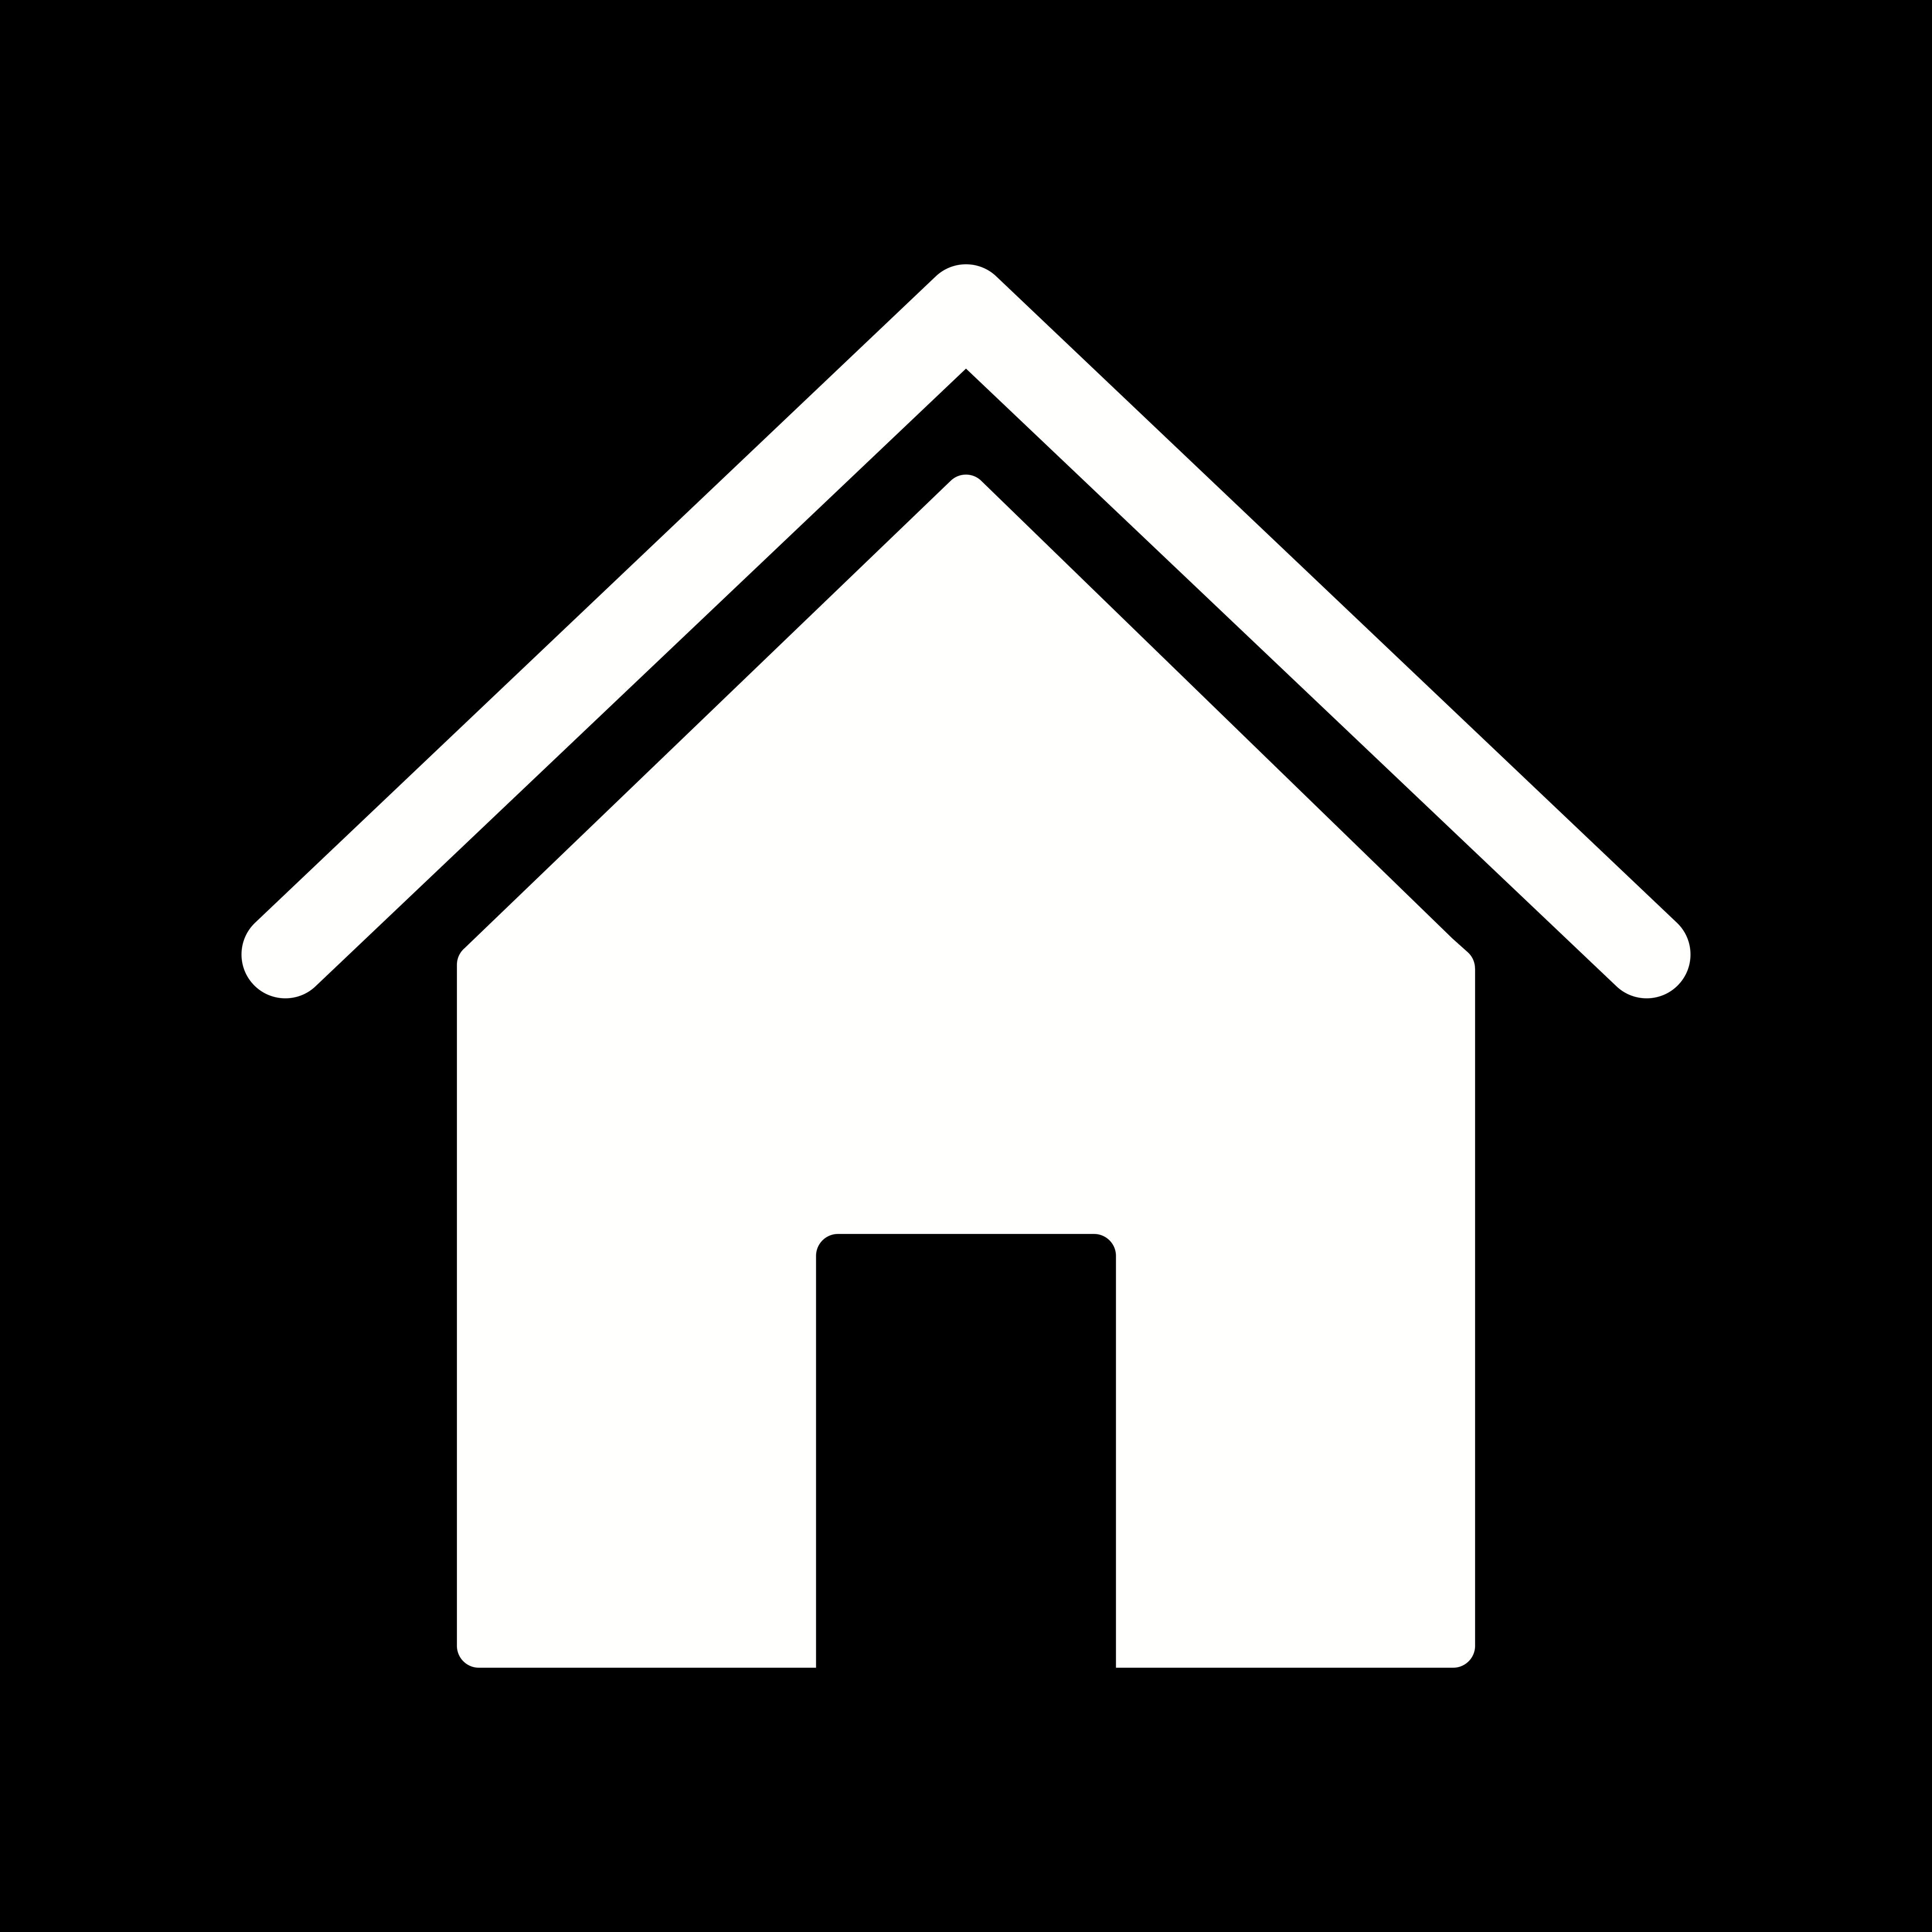 Home Vector Icon Download Free Vectors Clipart Graphics